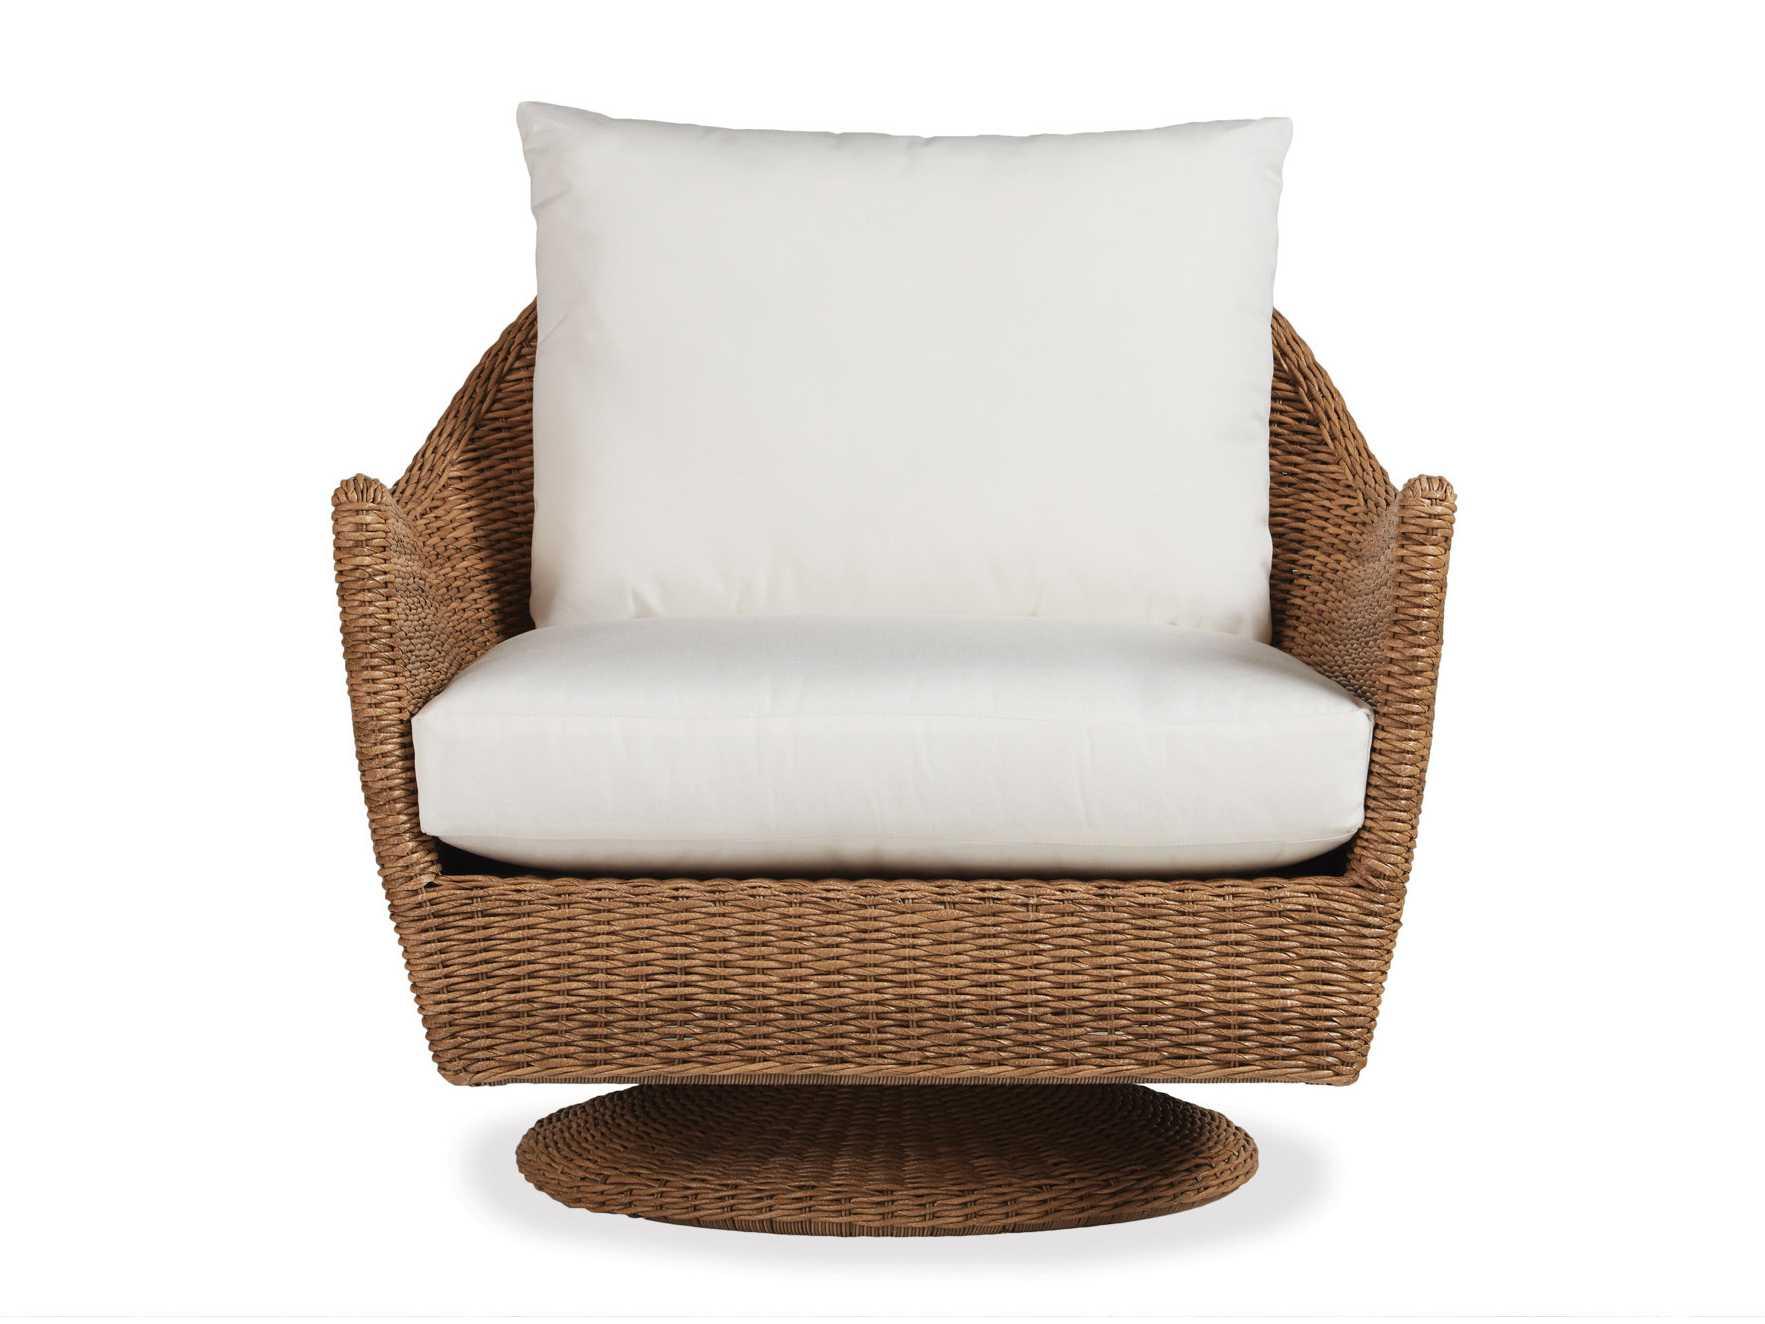 Lloyd Flanders Tobago Wicker Swivel Lounge Chair